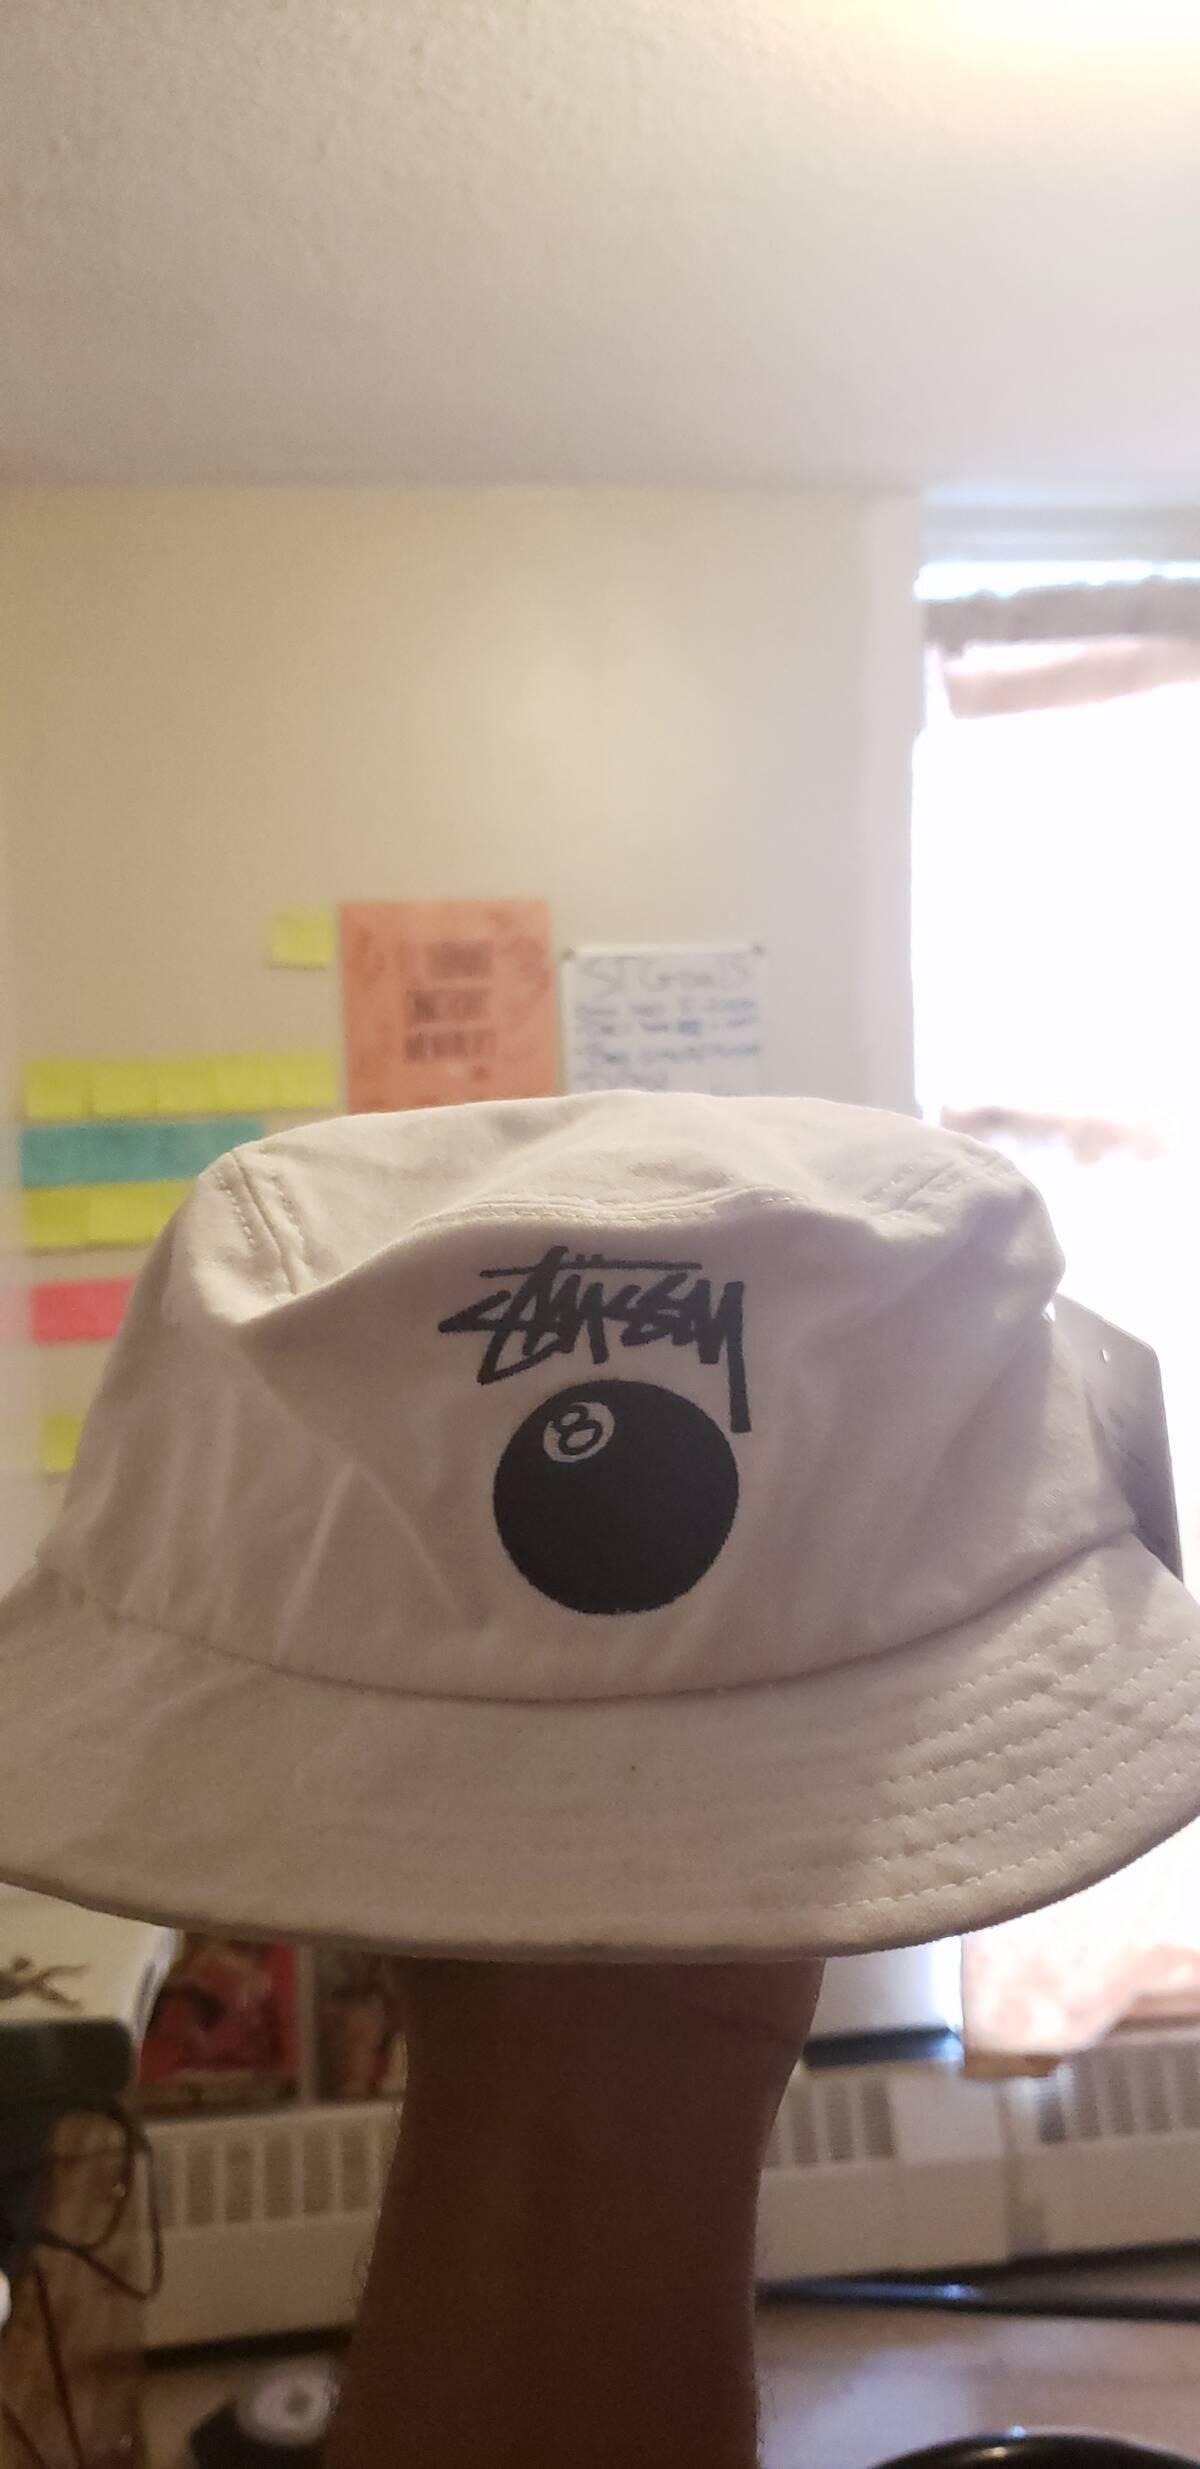 b0f91b1f7ca Stussy ×. Stussy 8 ball bucket hat white